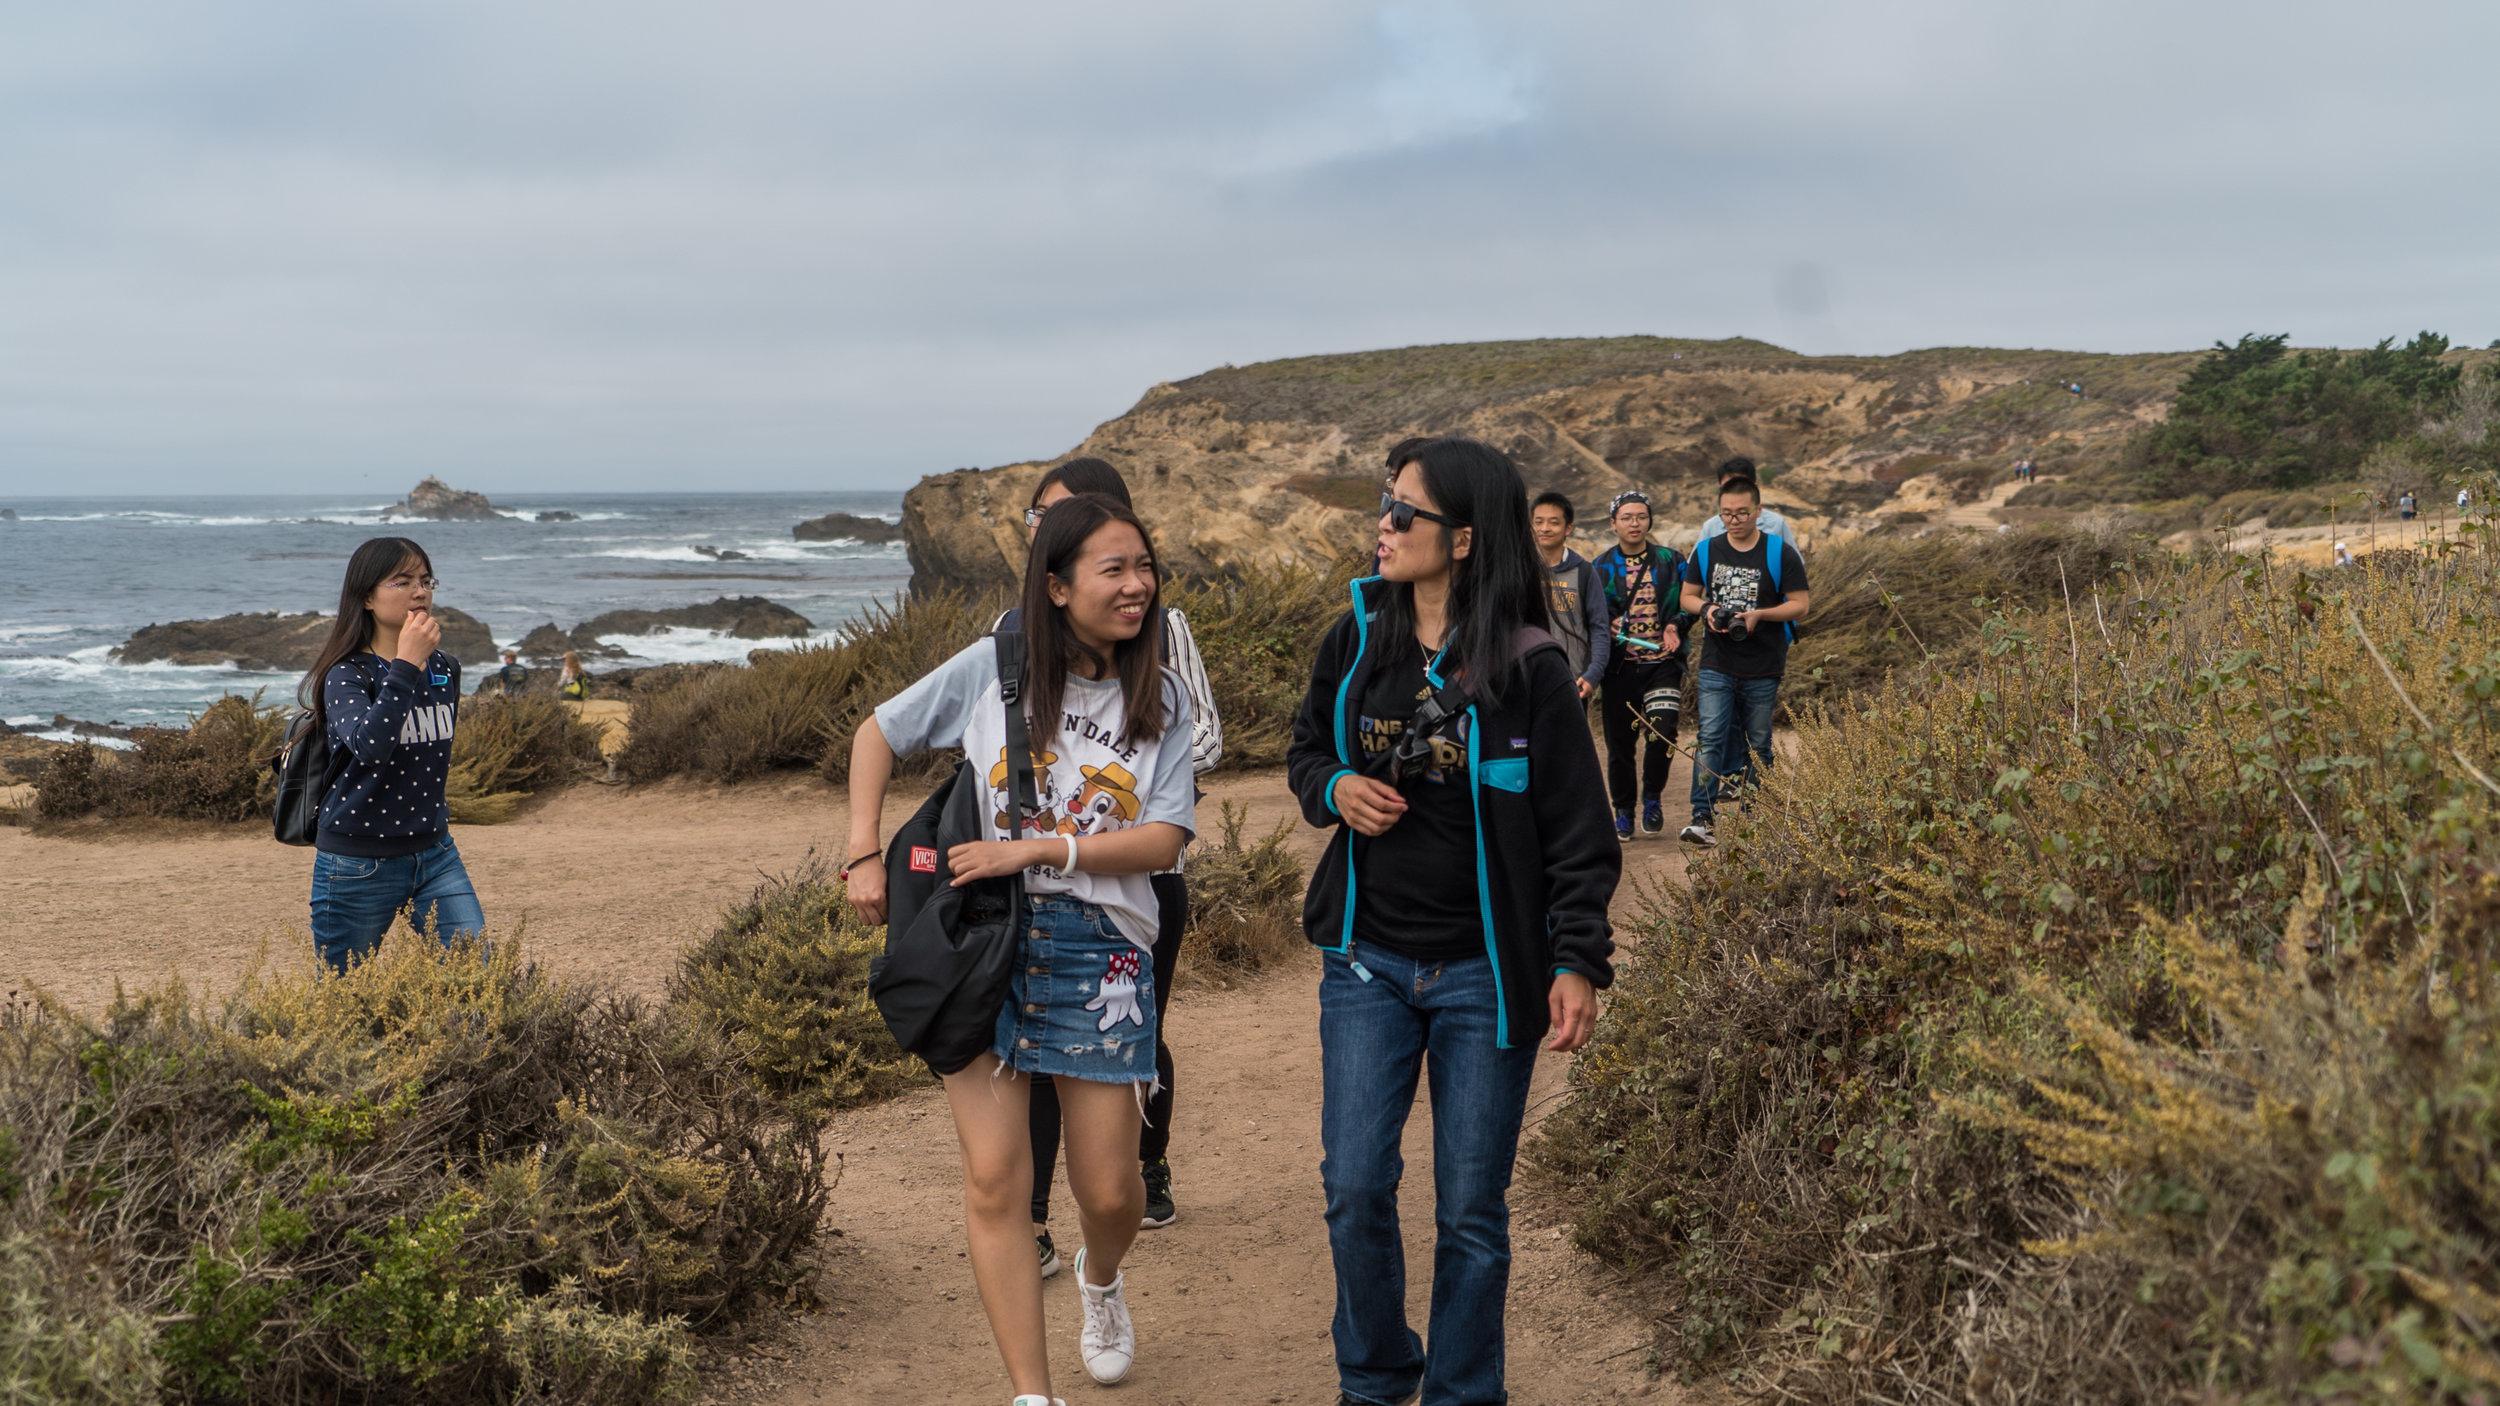 2017-09-09_IGSM_Monterey_Trip_DSC06807.jpg